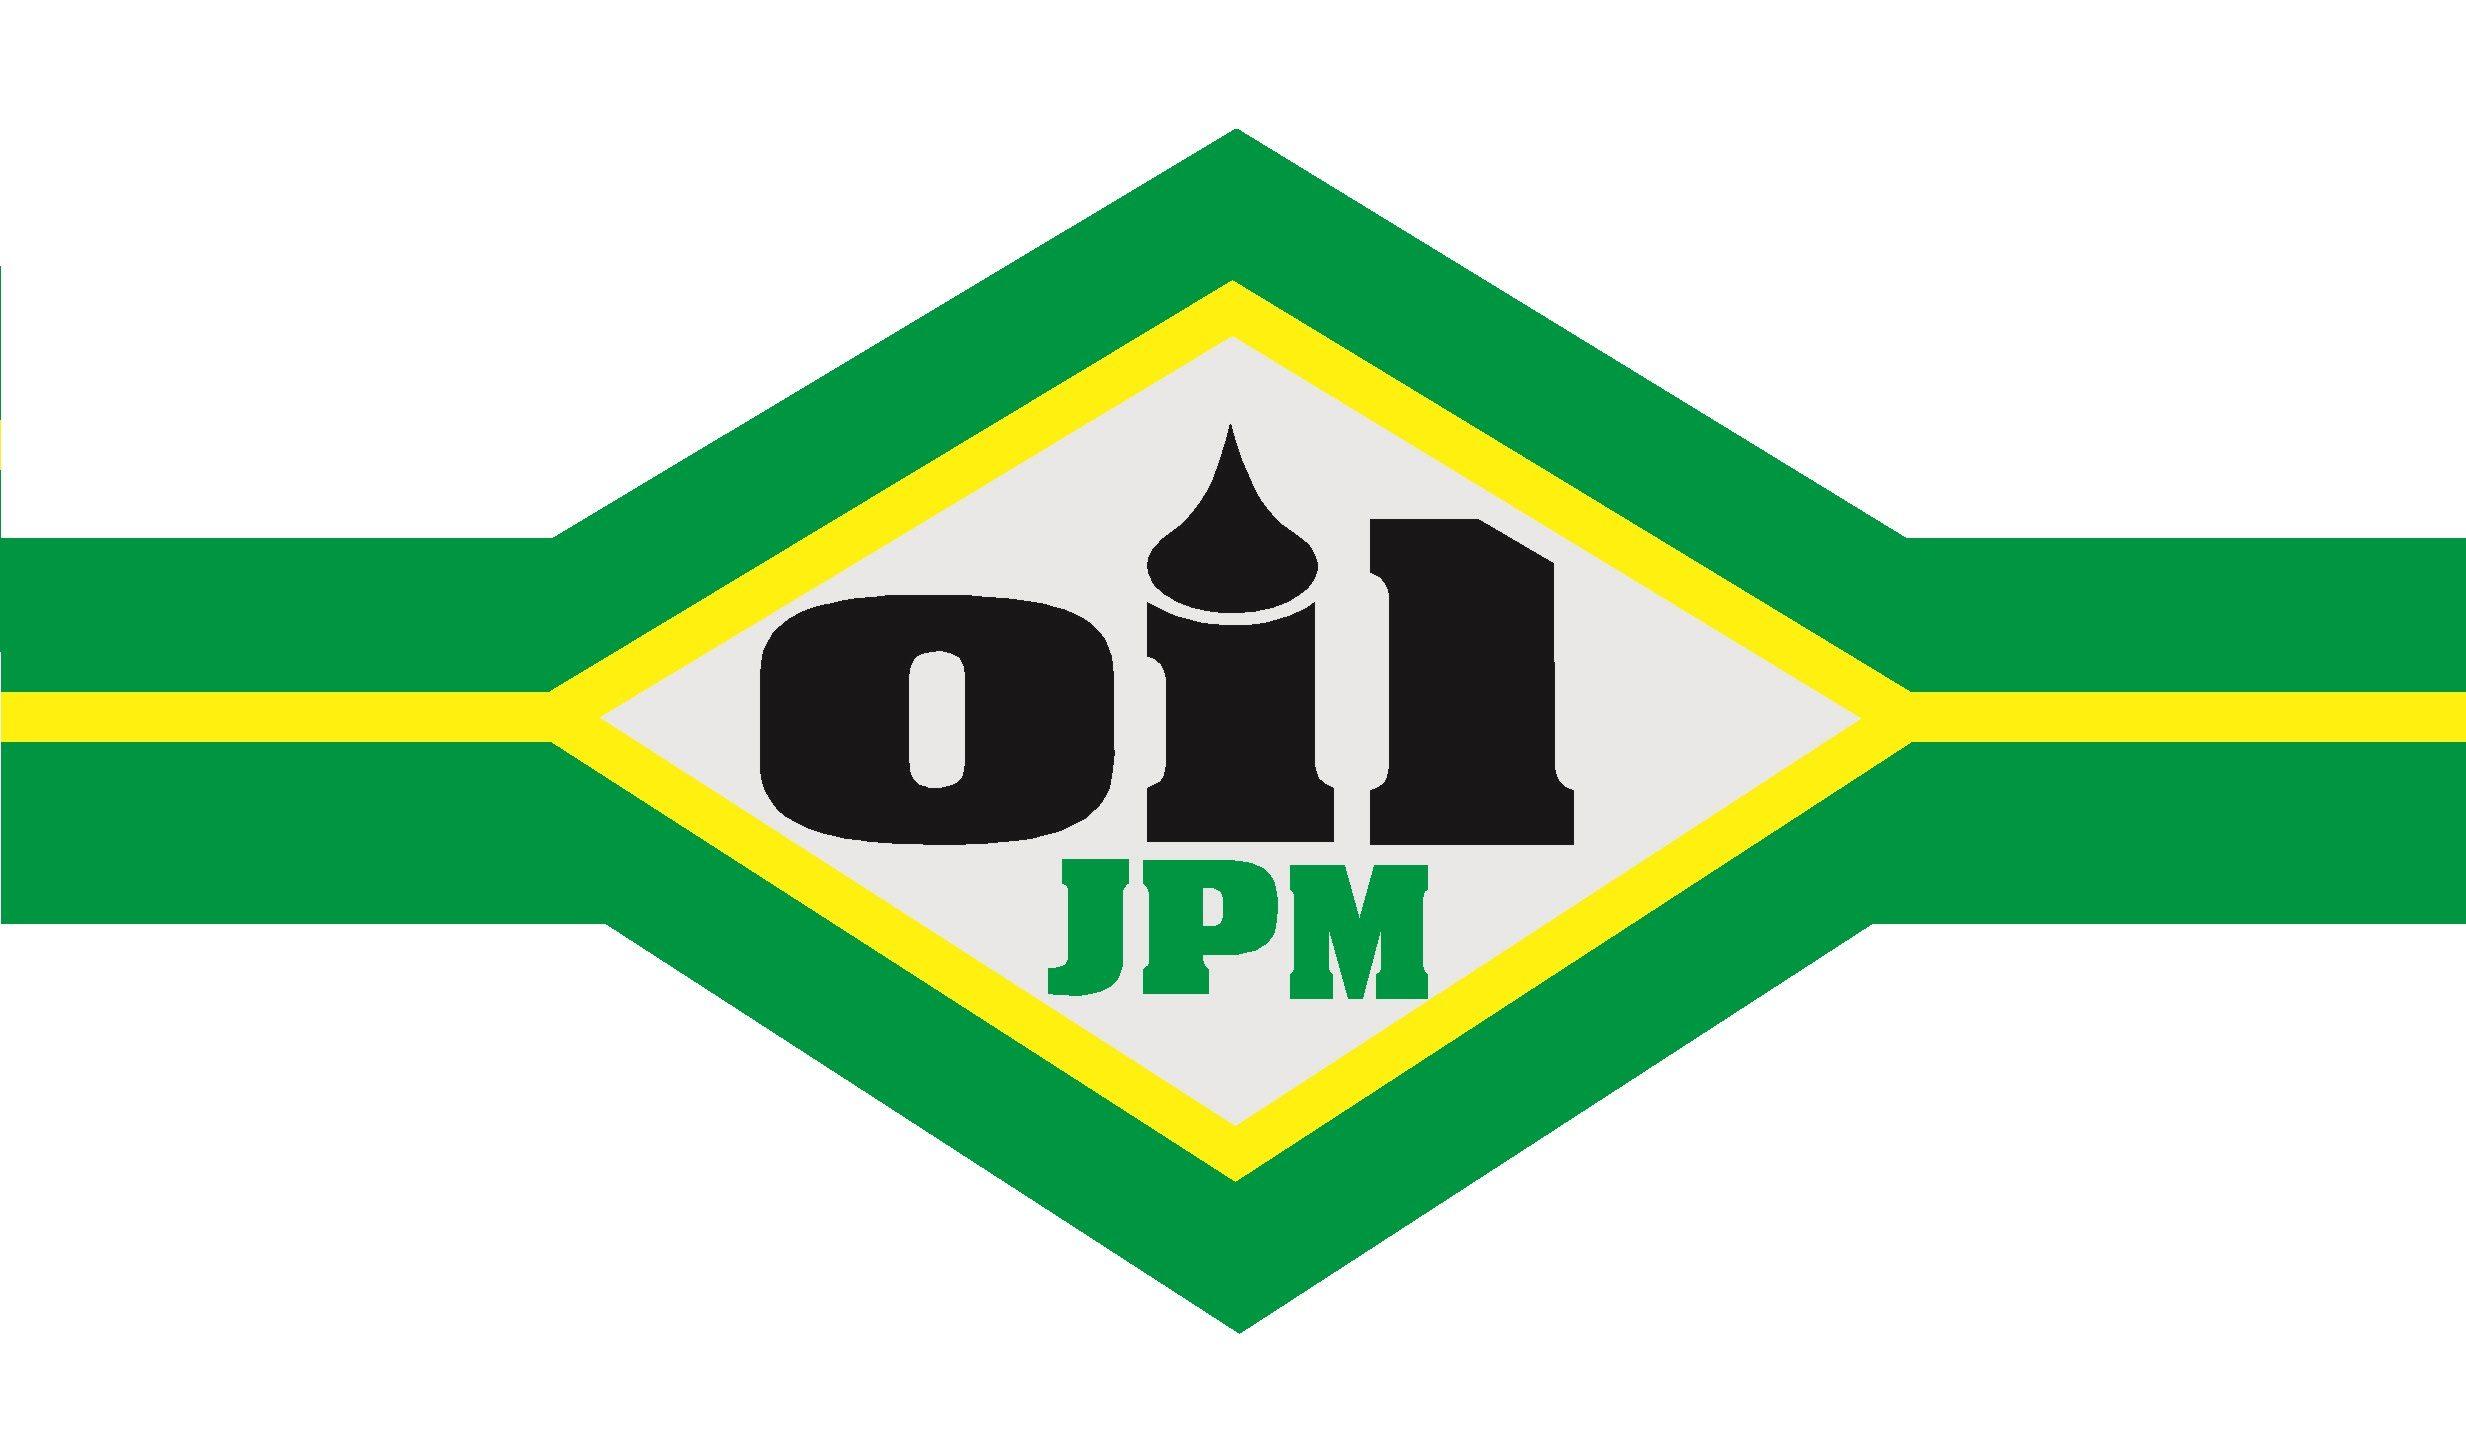 OIL JPM, s.r.o.